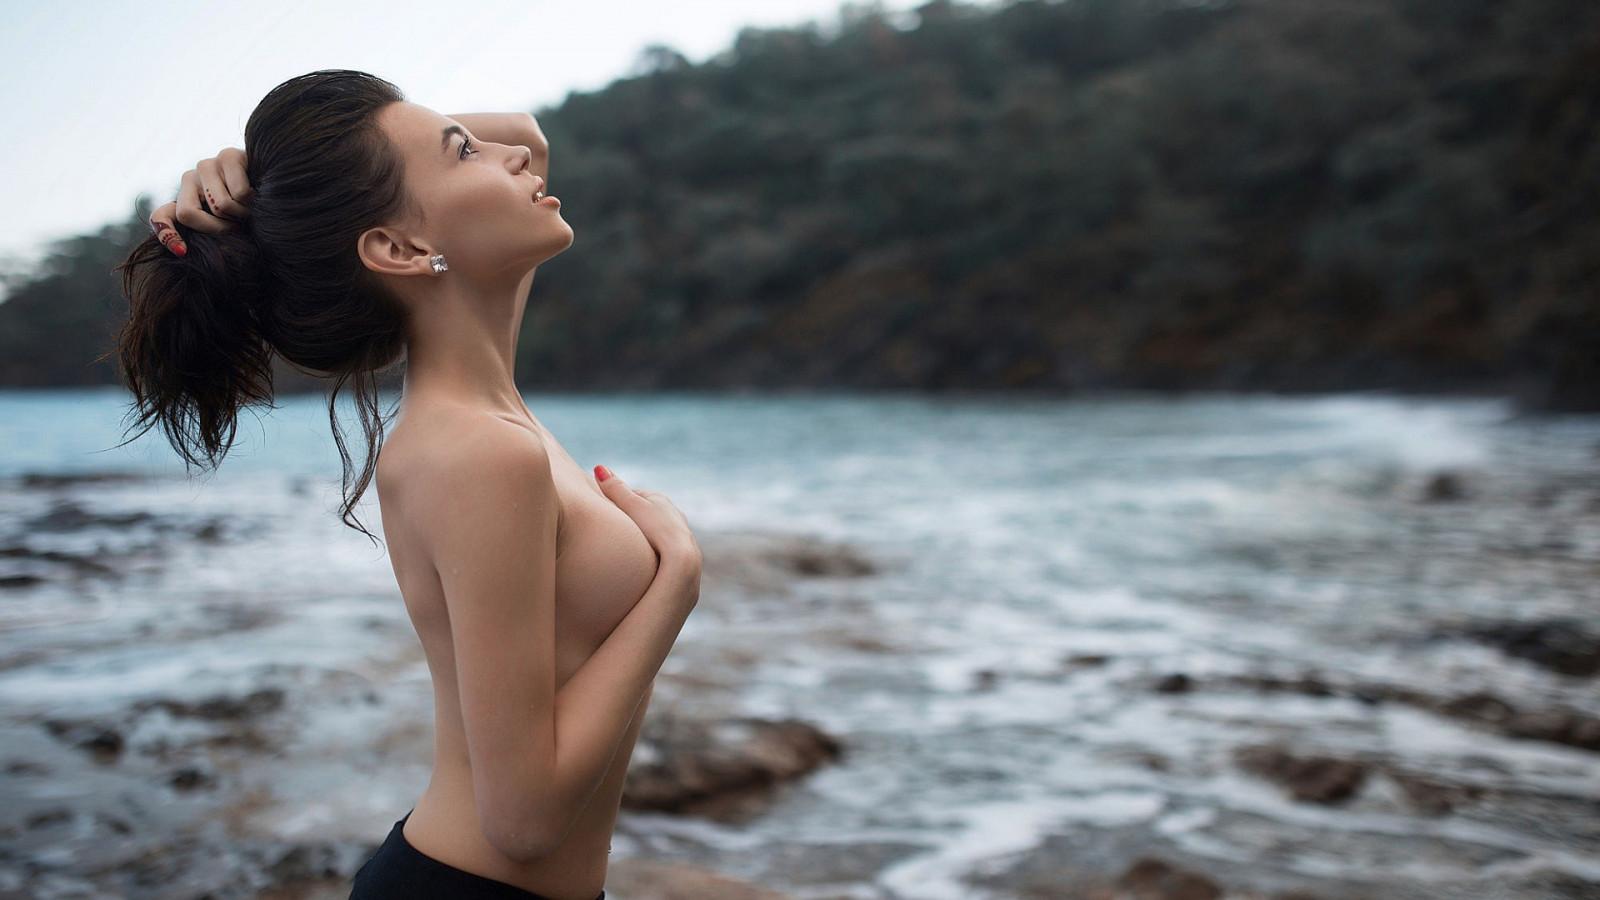 fotki-golih-bryunetok